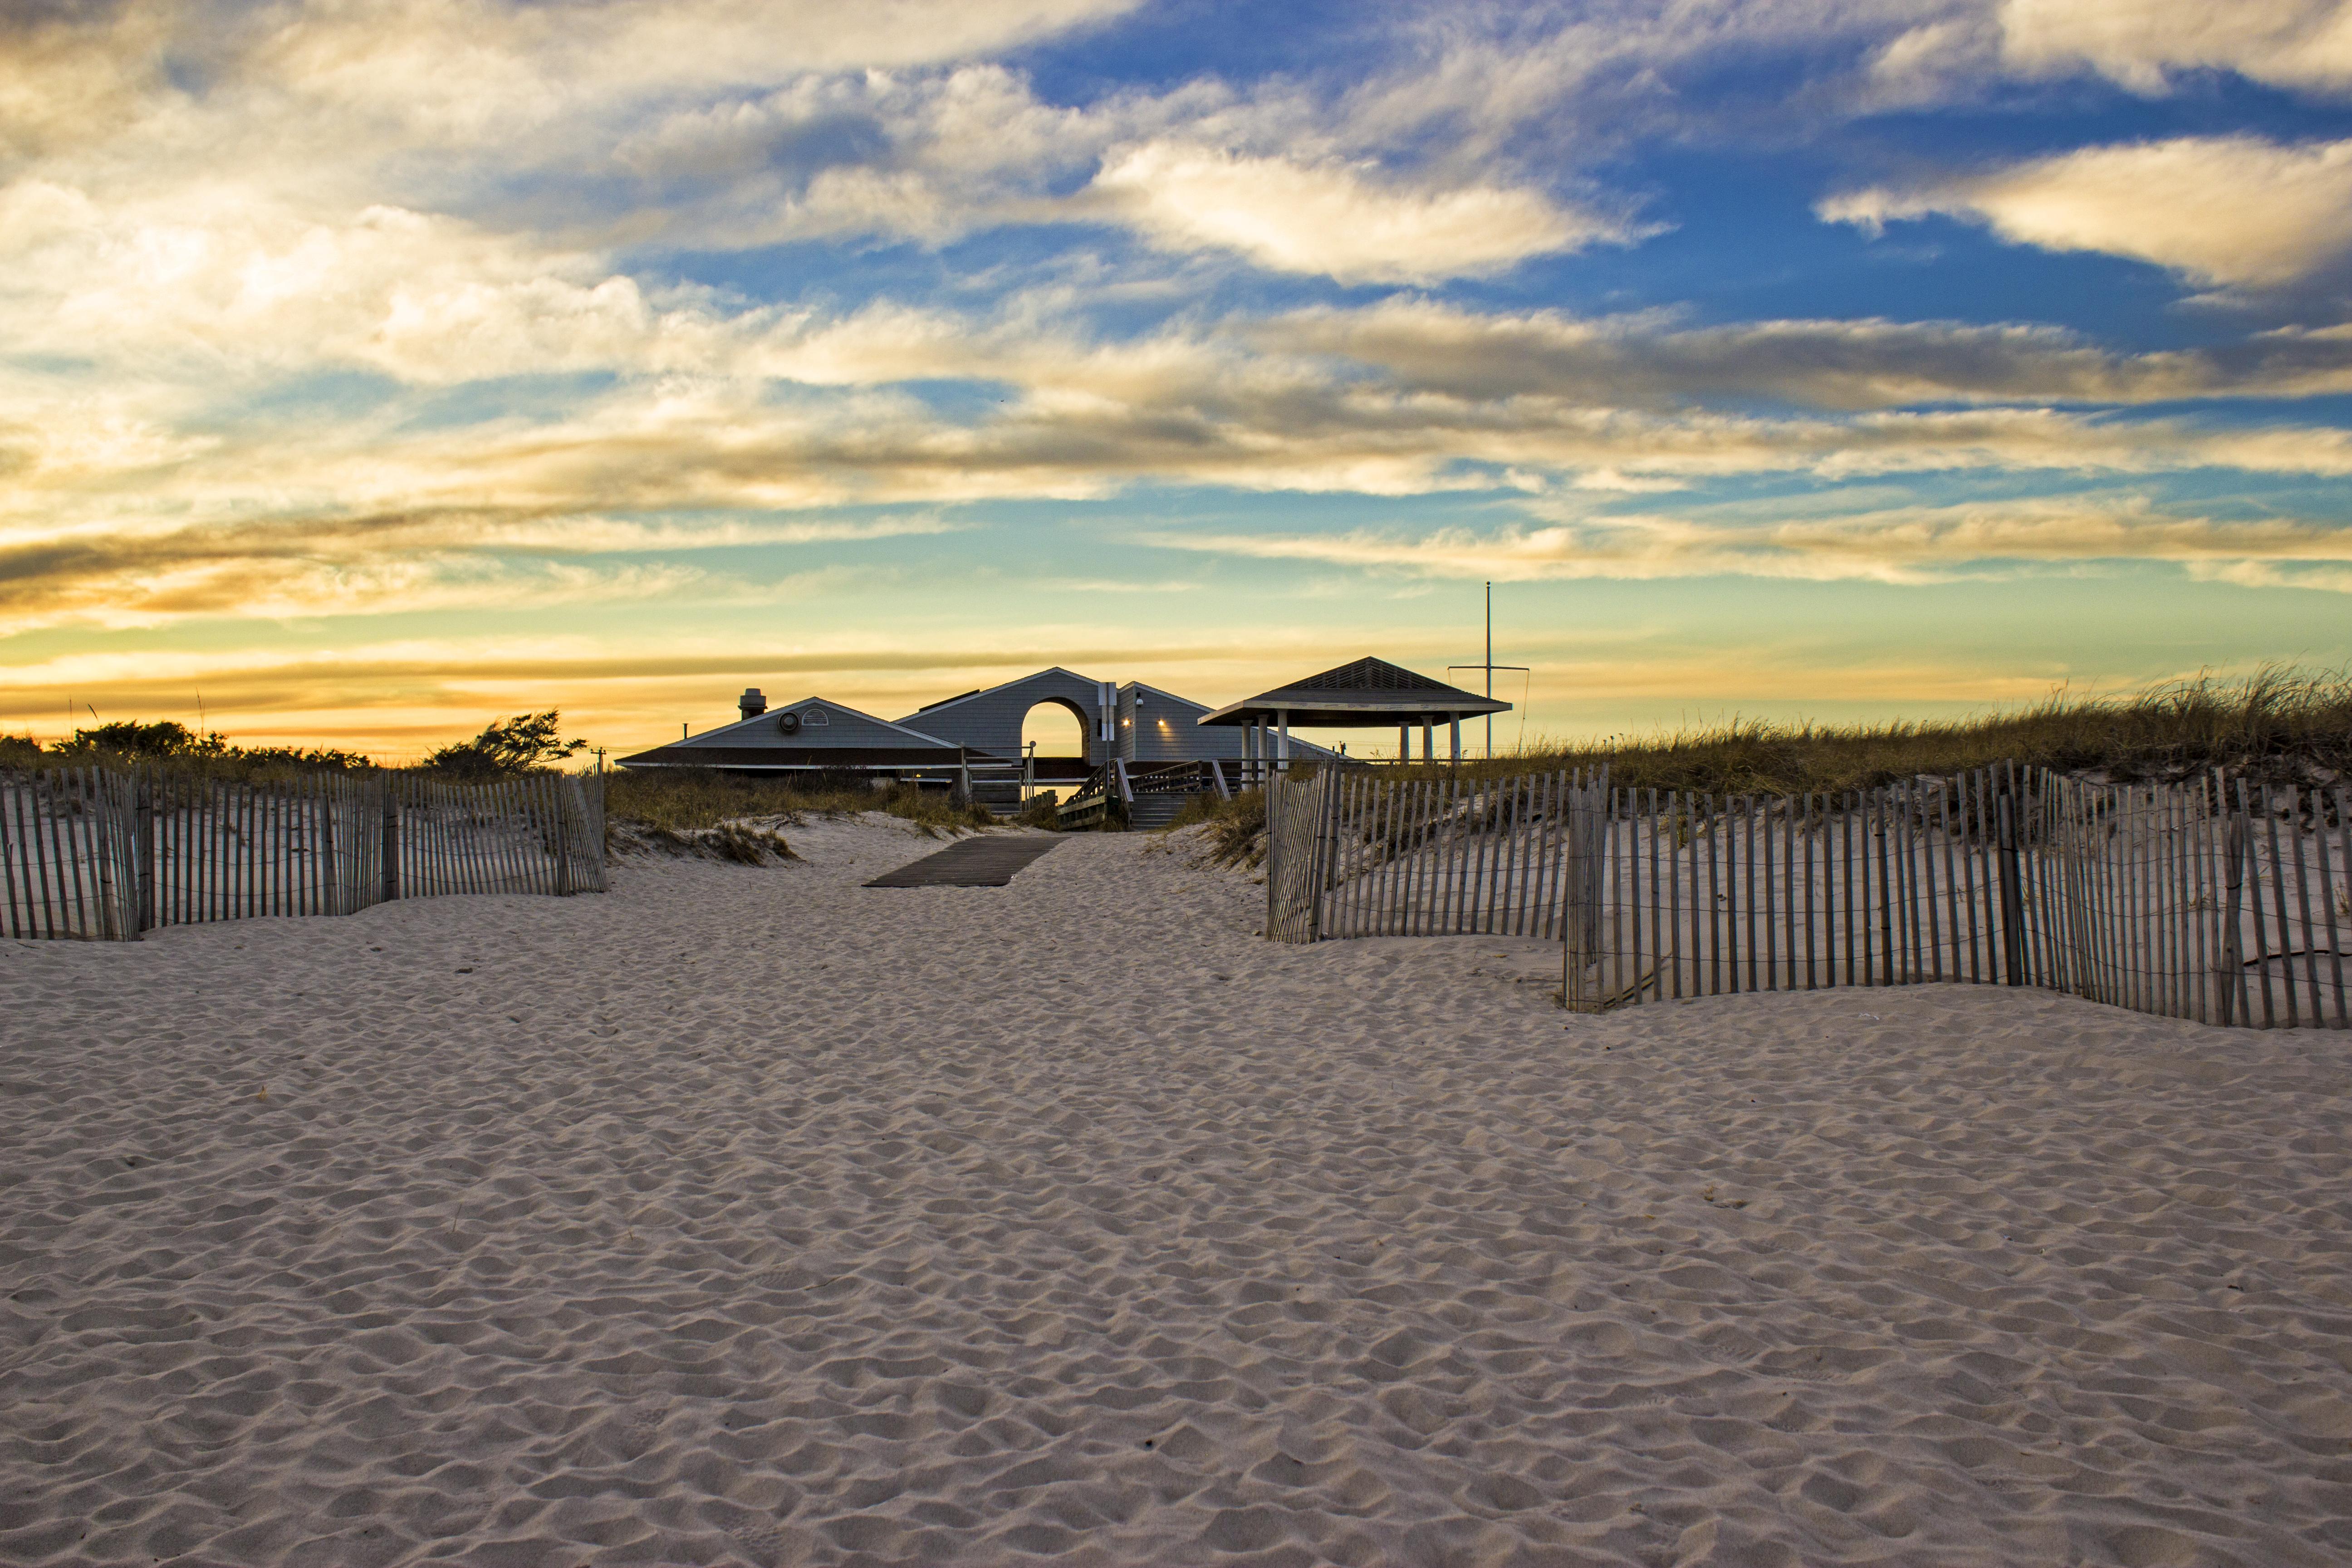 rogers beach